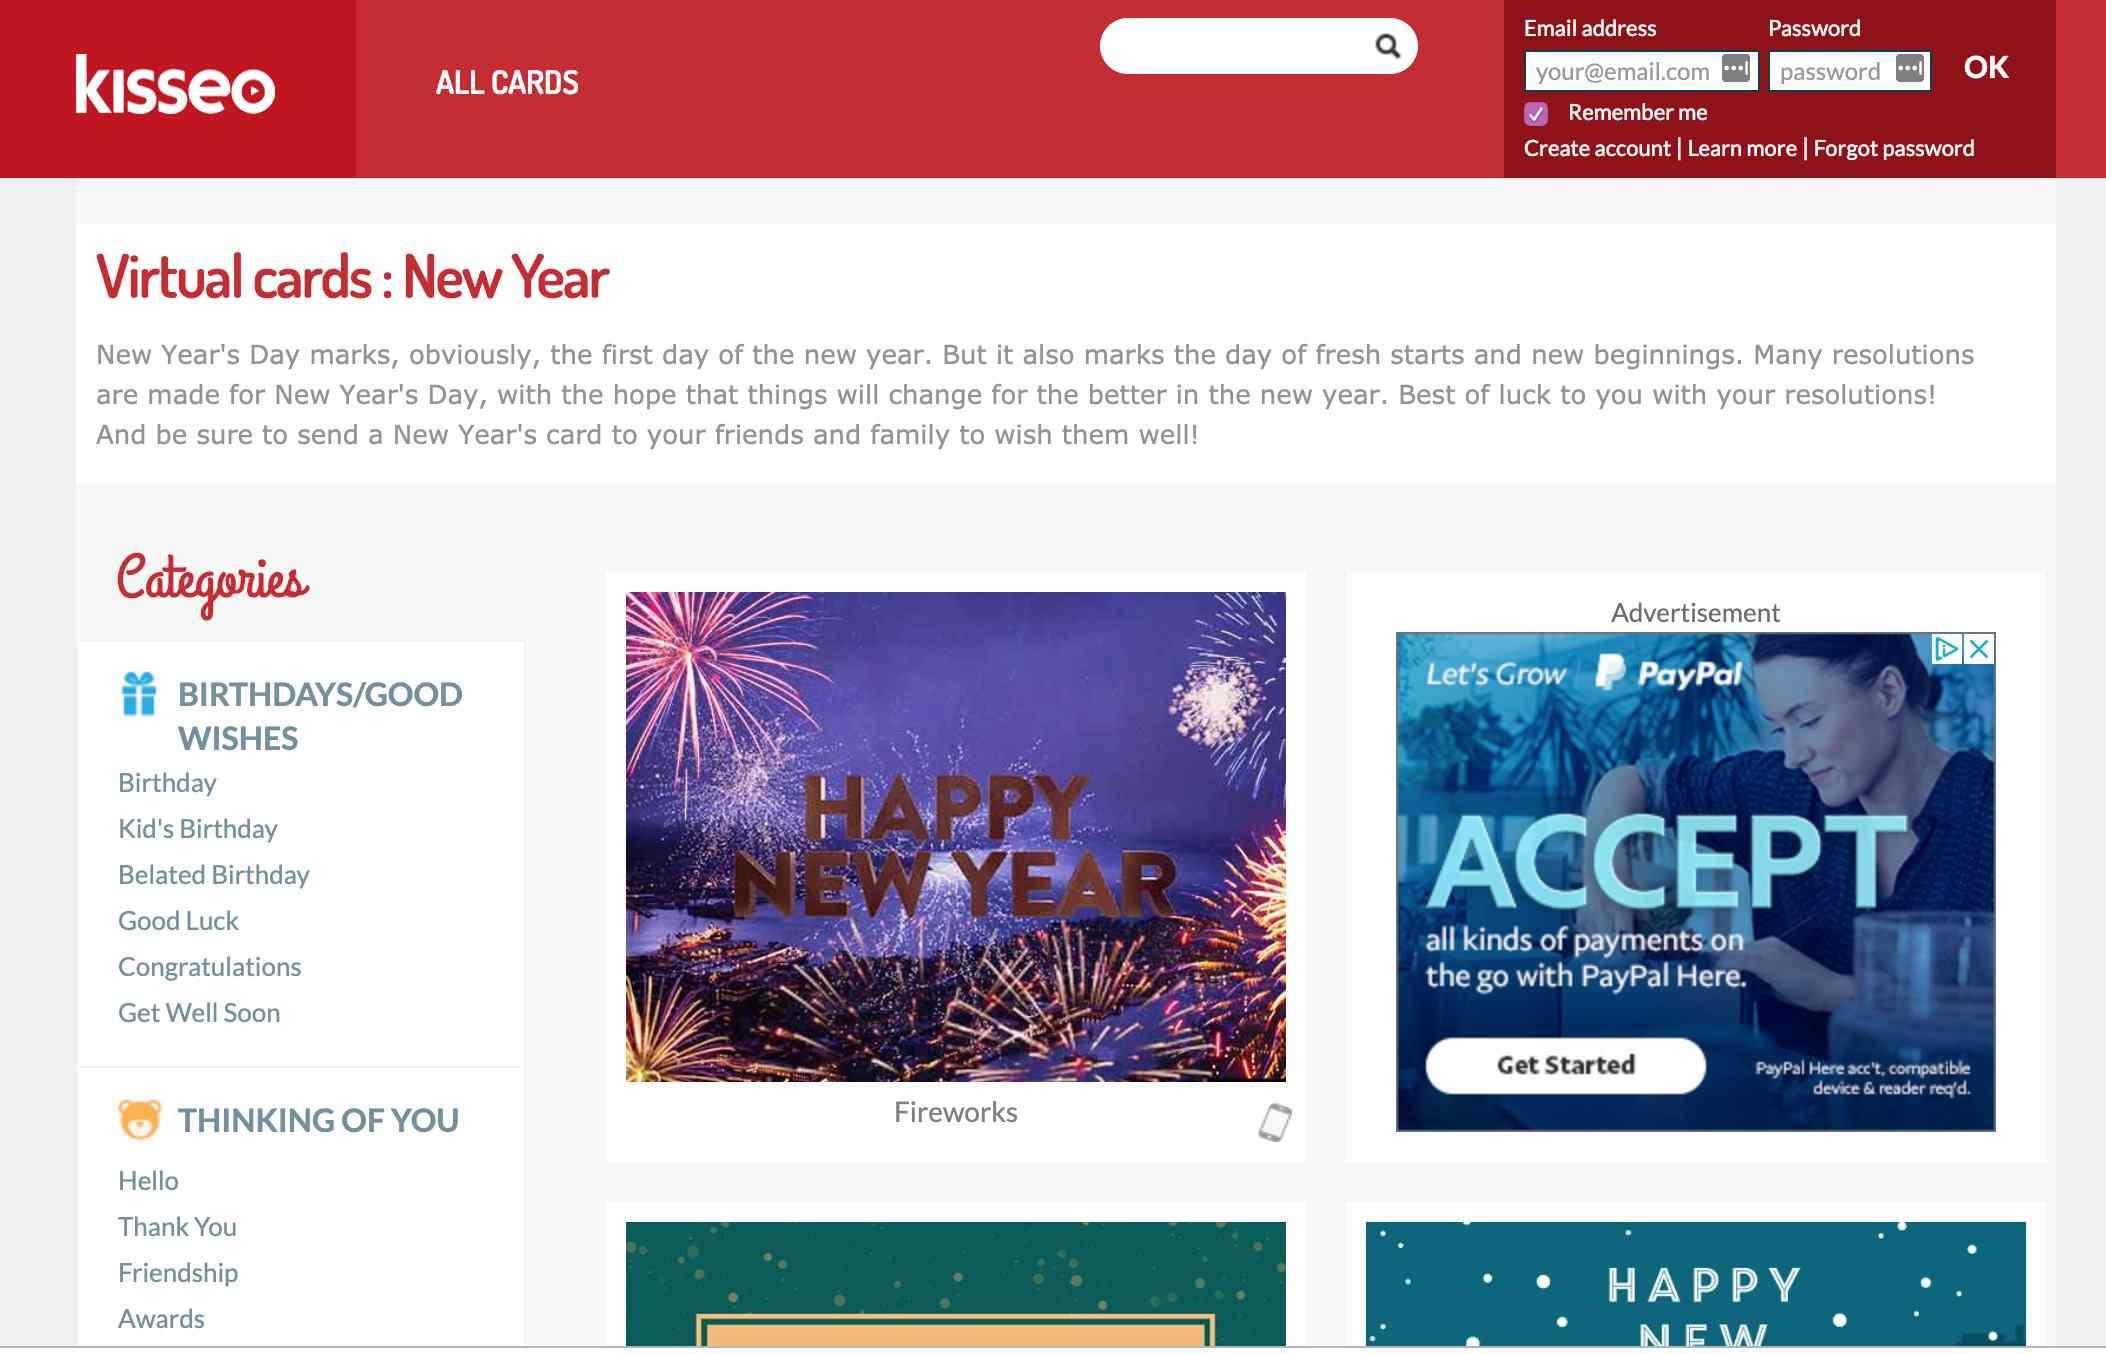 Kisseo web page